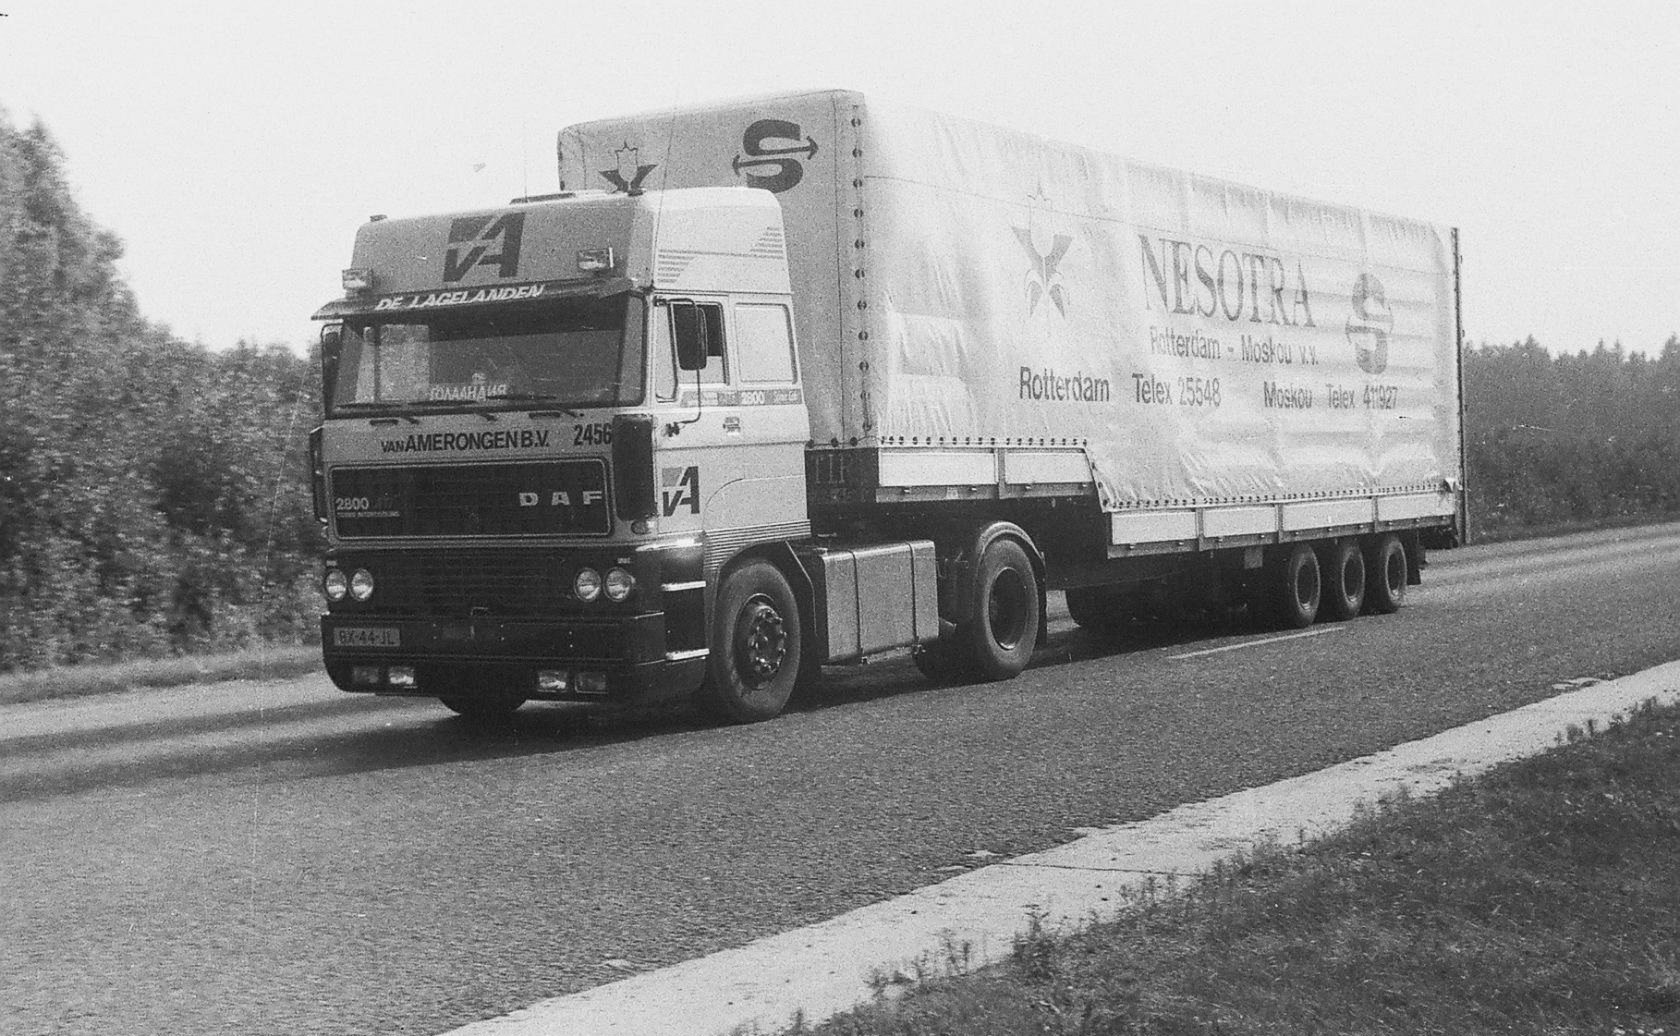 Chaerter-Sovavto-end-1980-Igor-Akopov-foto